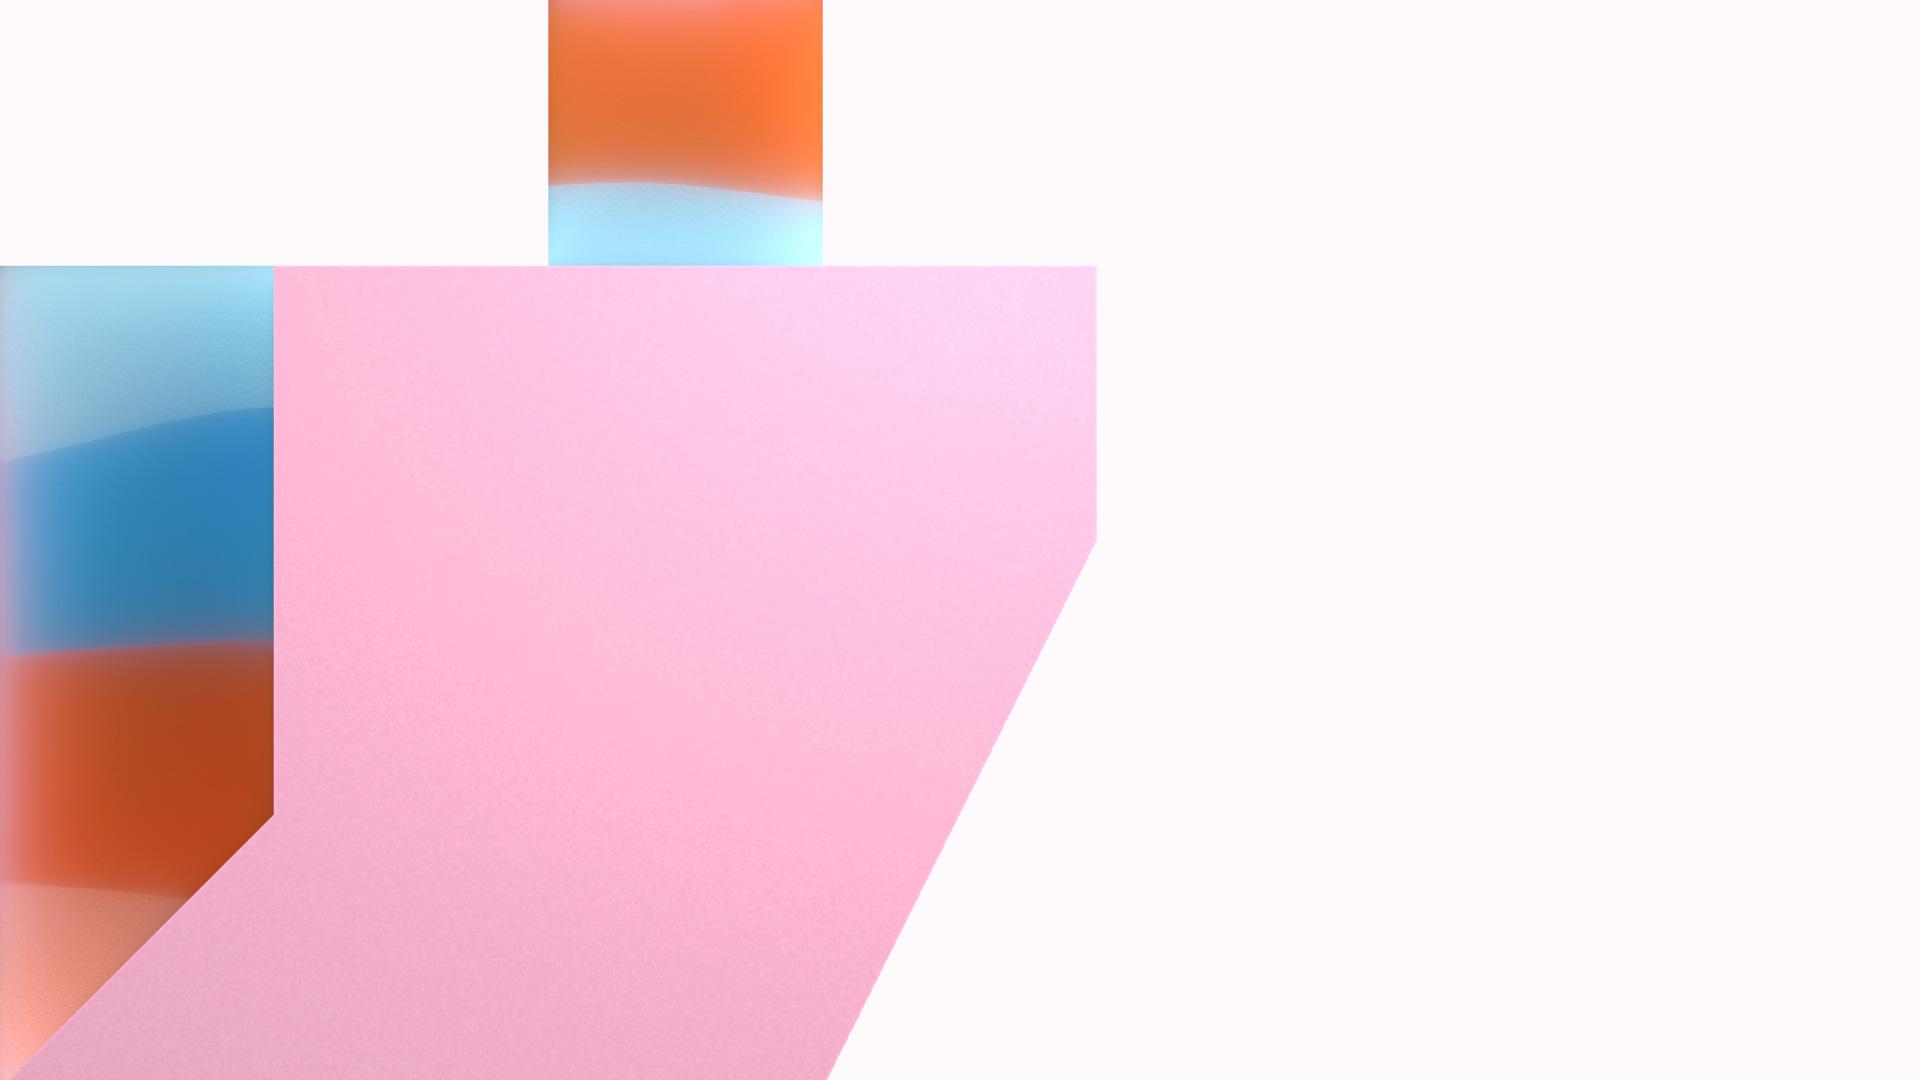 Background 6